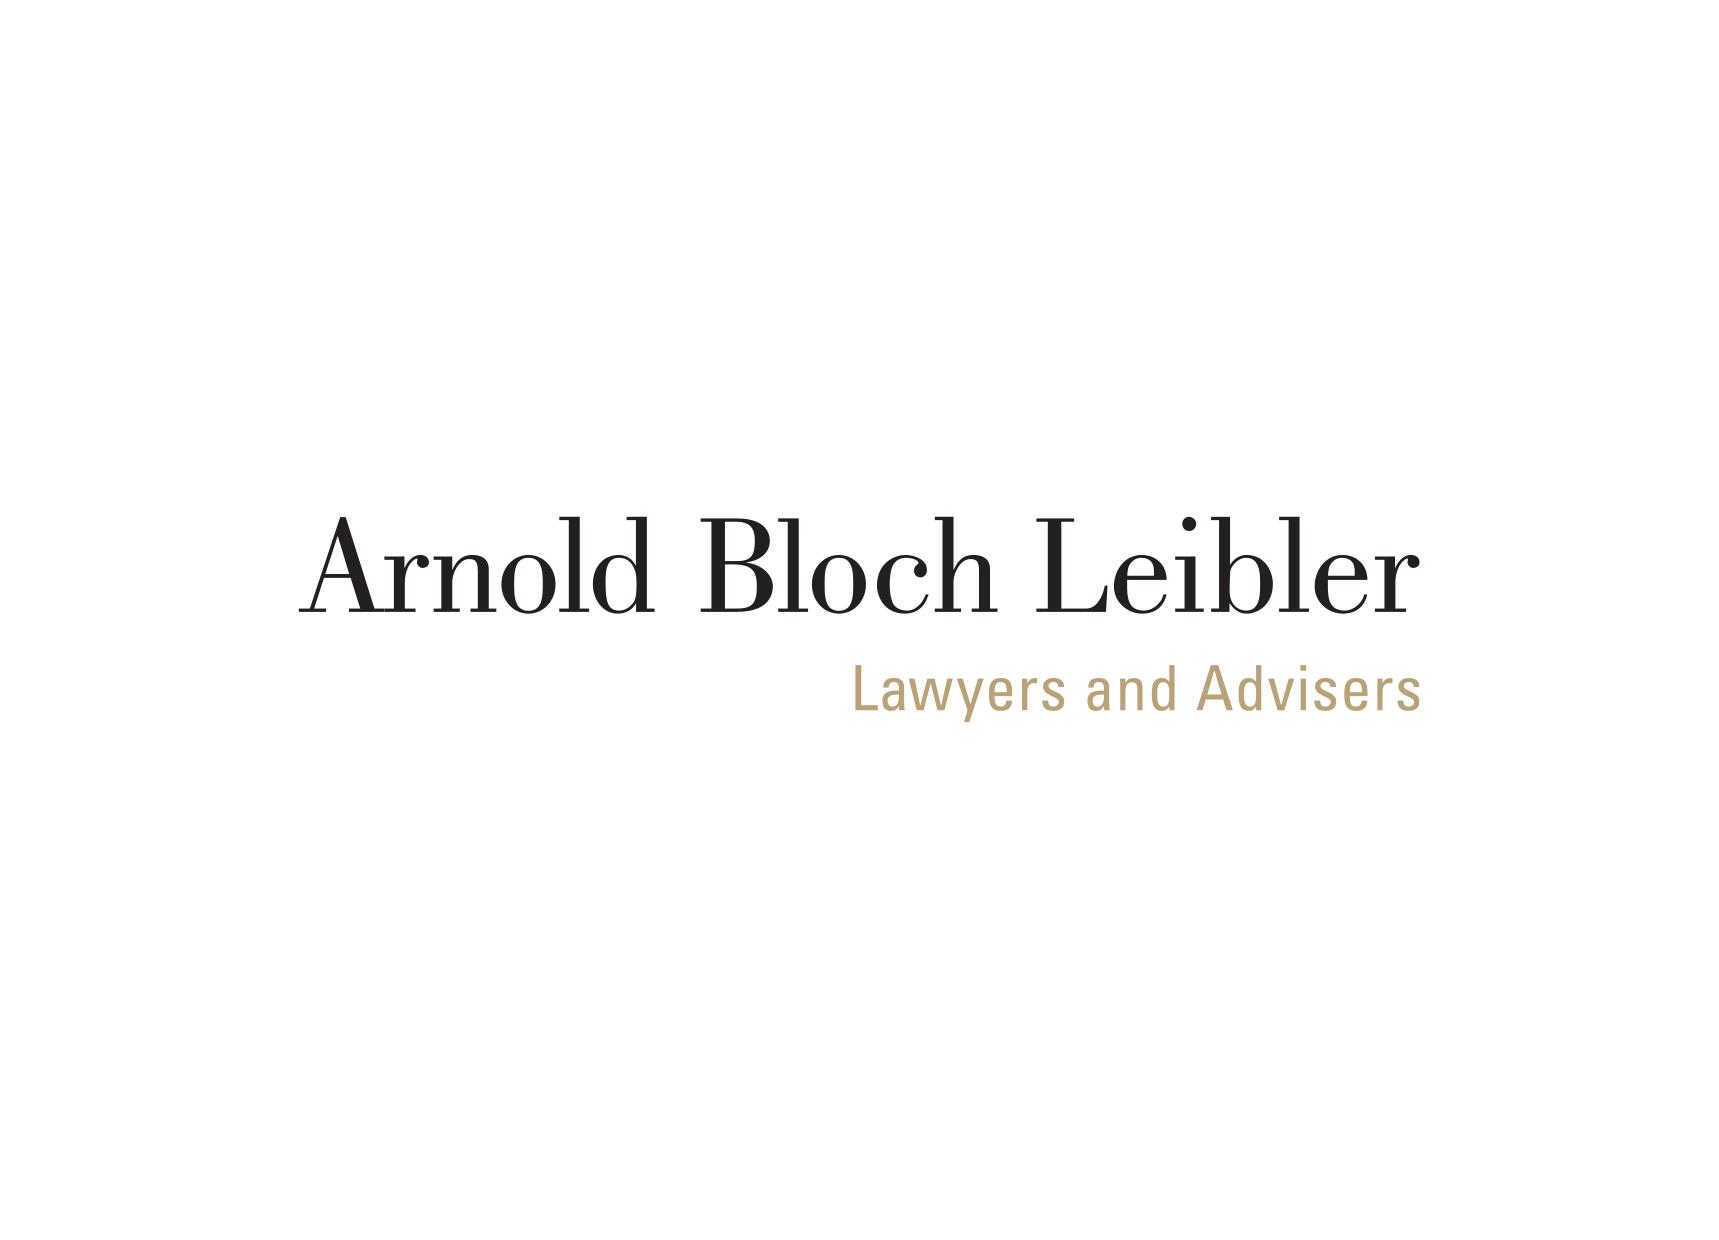 Logo Tiles - ABL